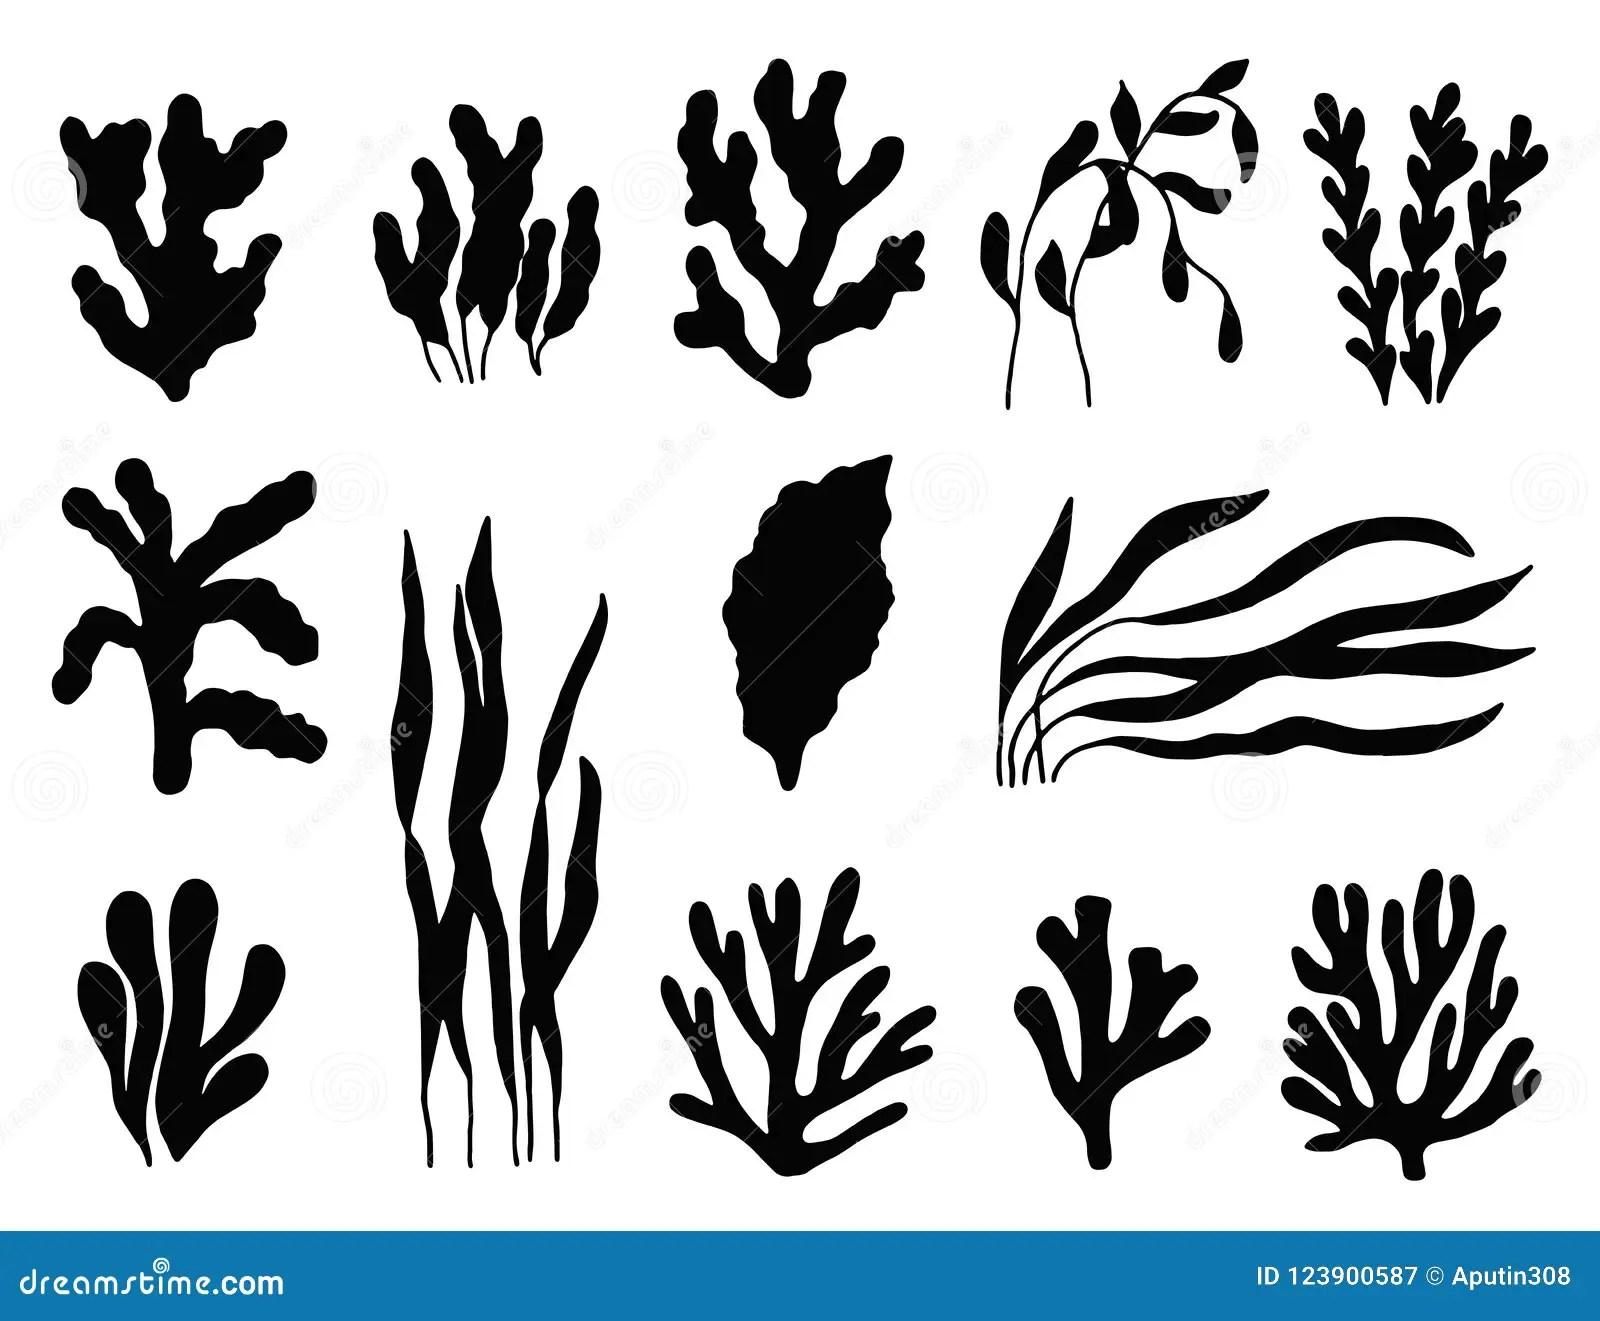 Seaweed Silhouette Isolated Marine Plants On White